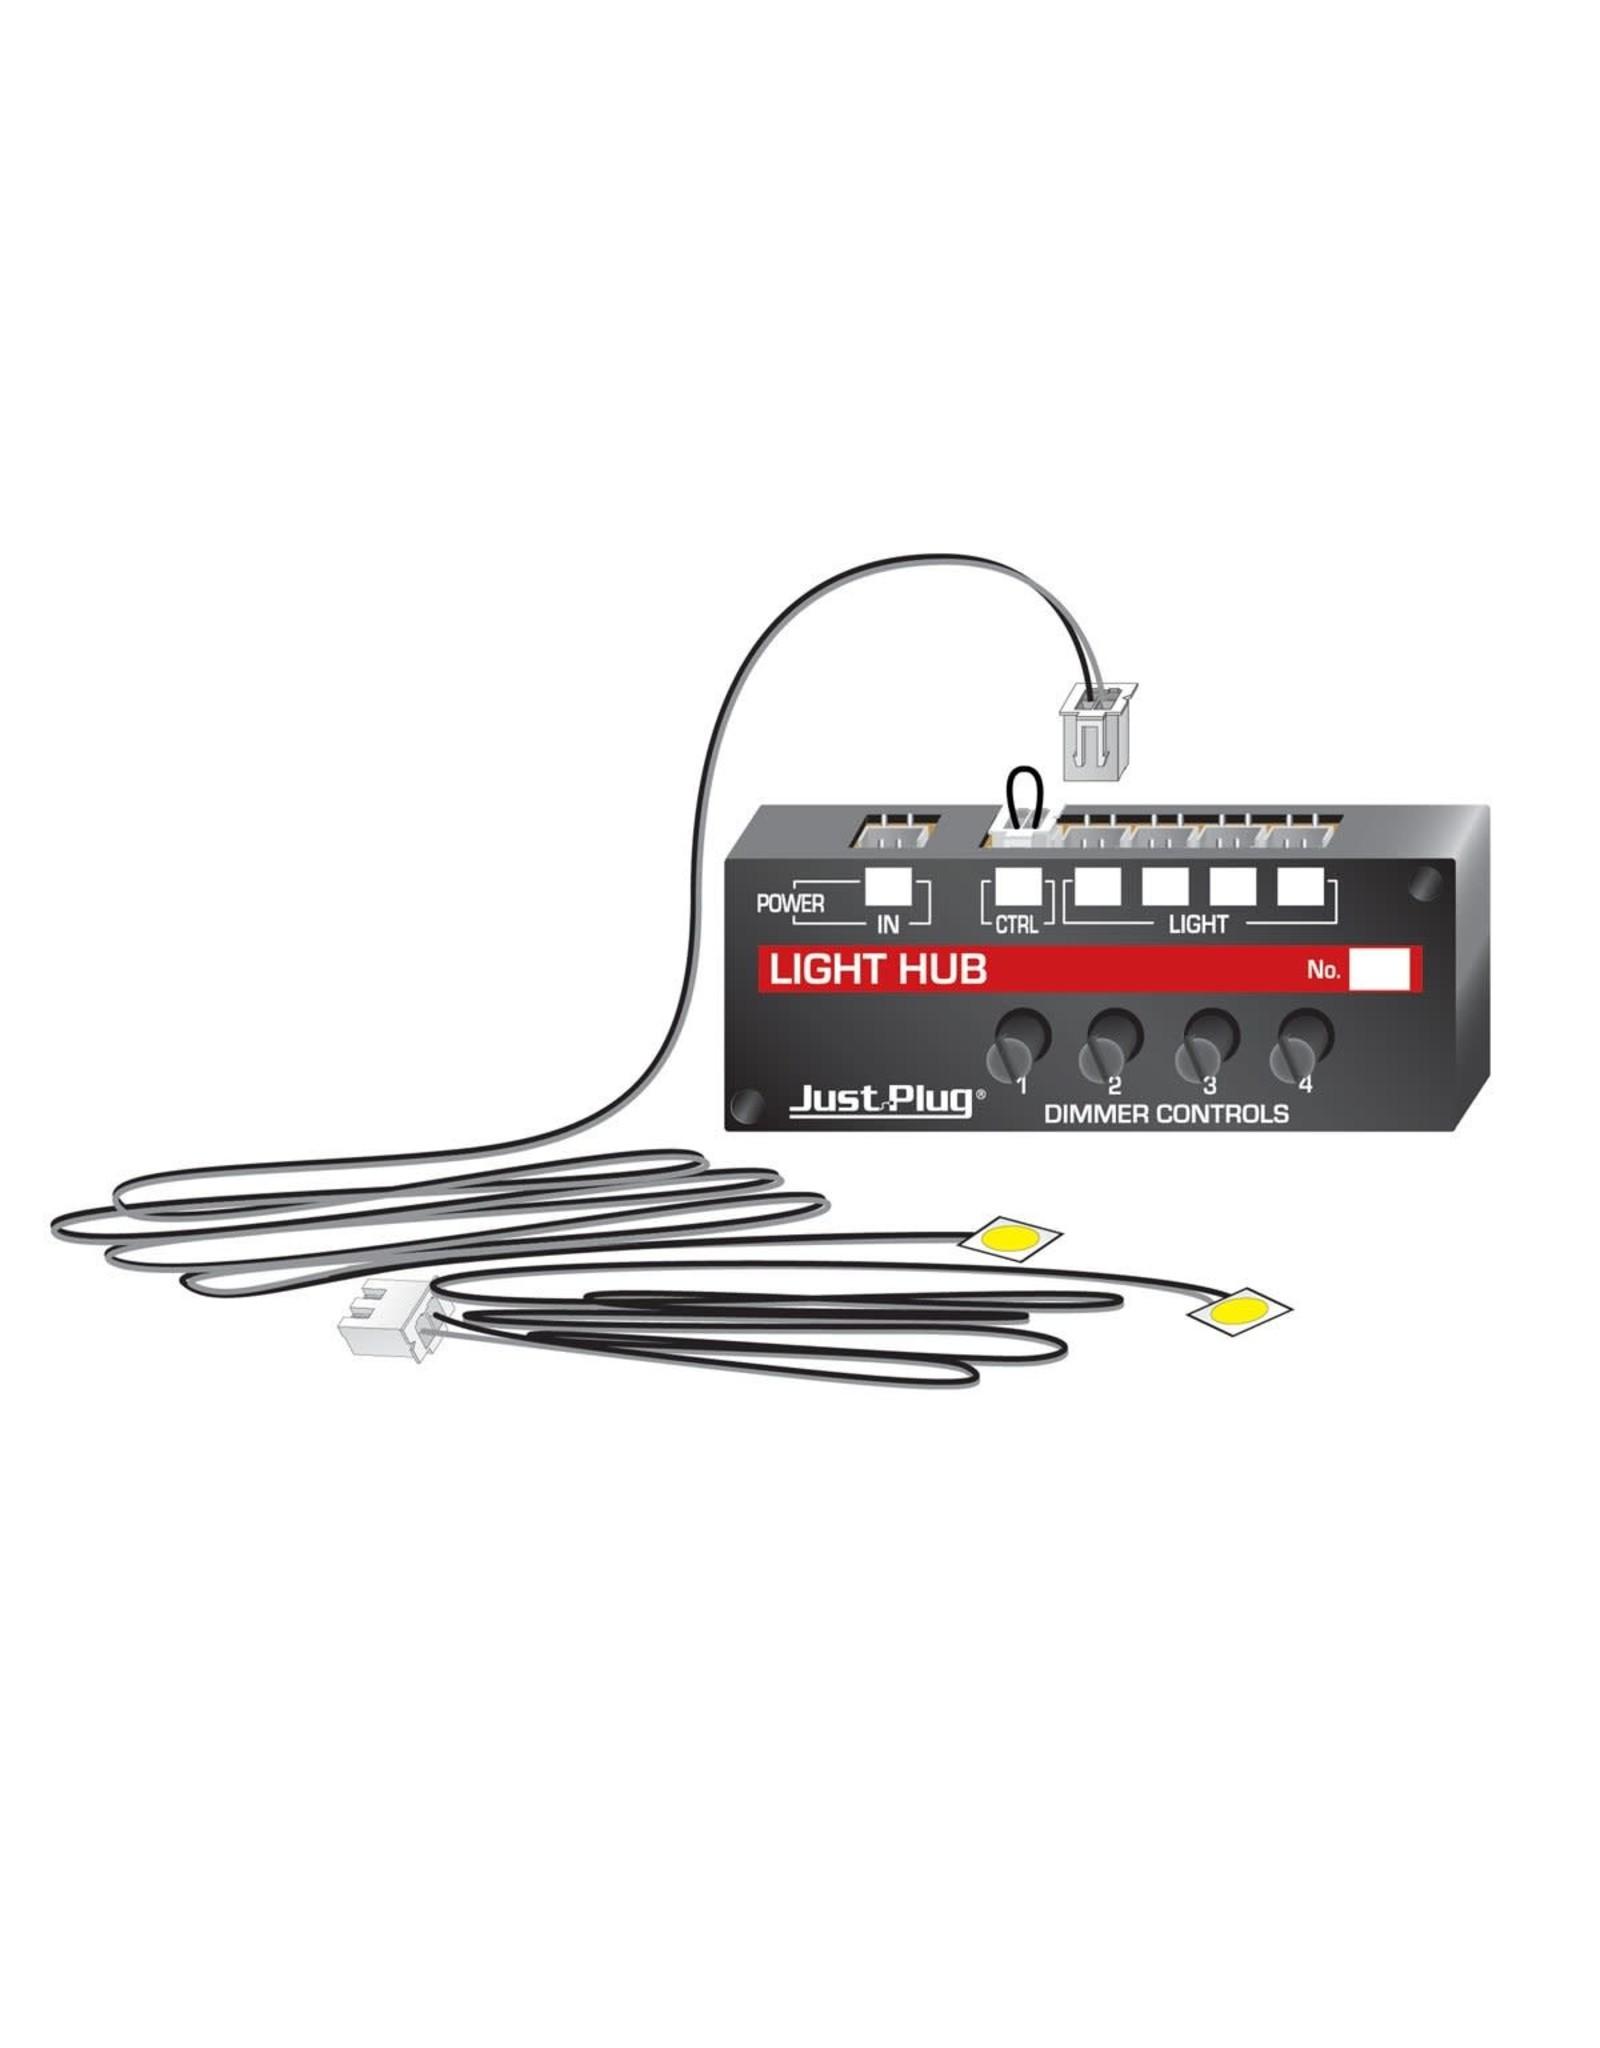 Woodland Scenics Expansion Hub - Just Plug Lighting System -- Use w/#785-5700 or 5701